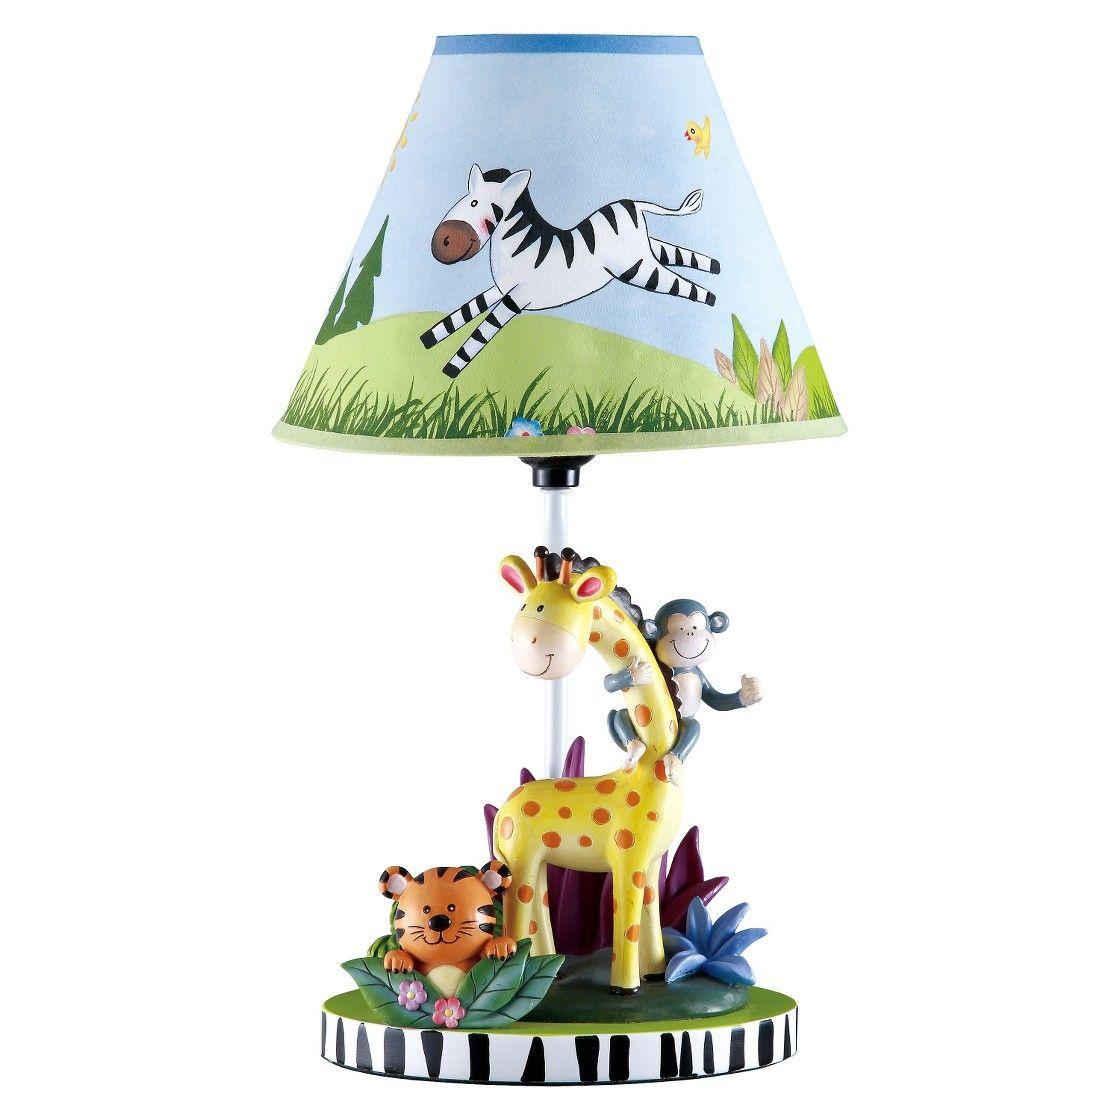 Target online teamson kids table lamp sunny safari kids target online teamson kids table lamp sunny safari mozeypictures Choice Image